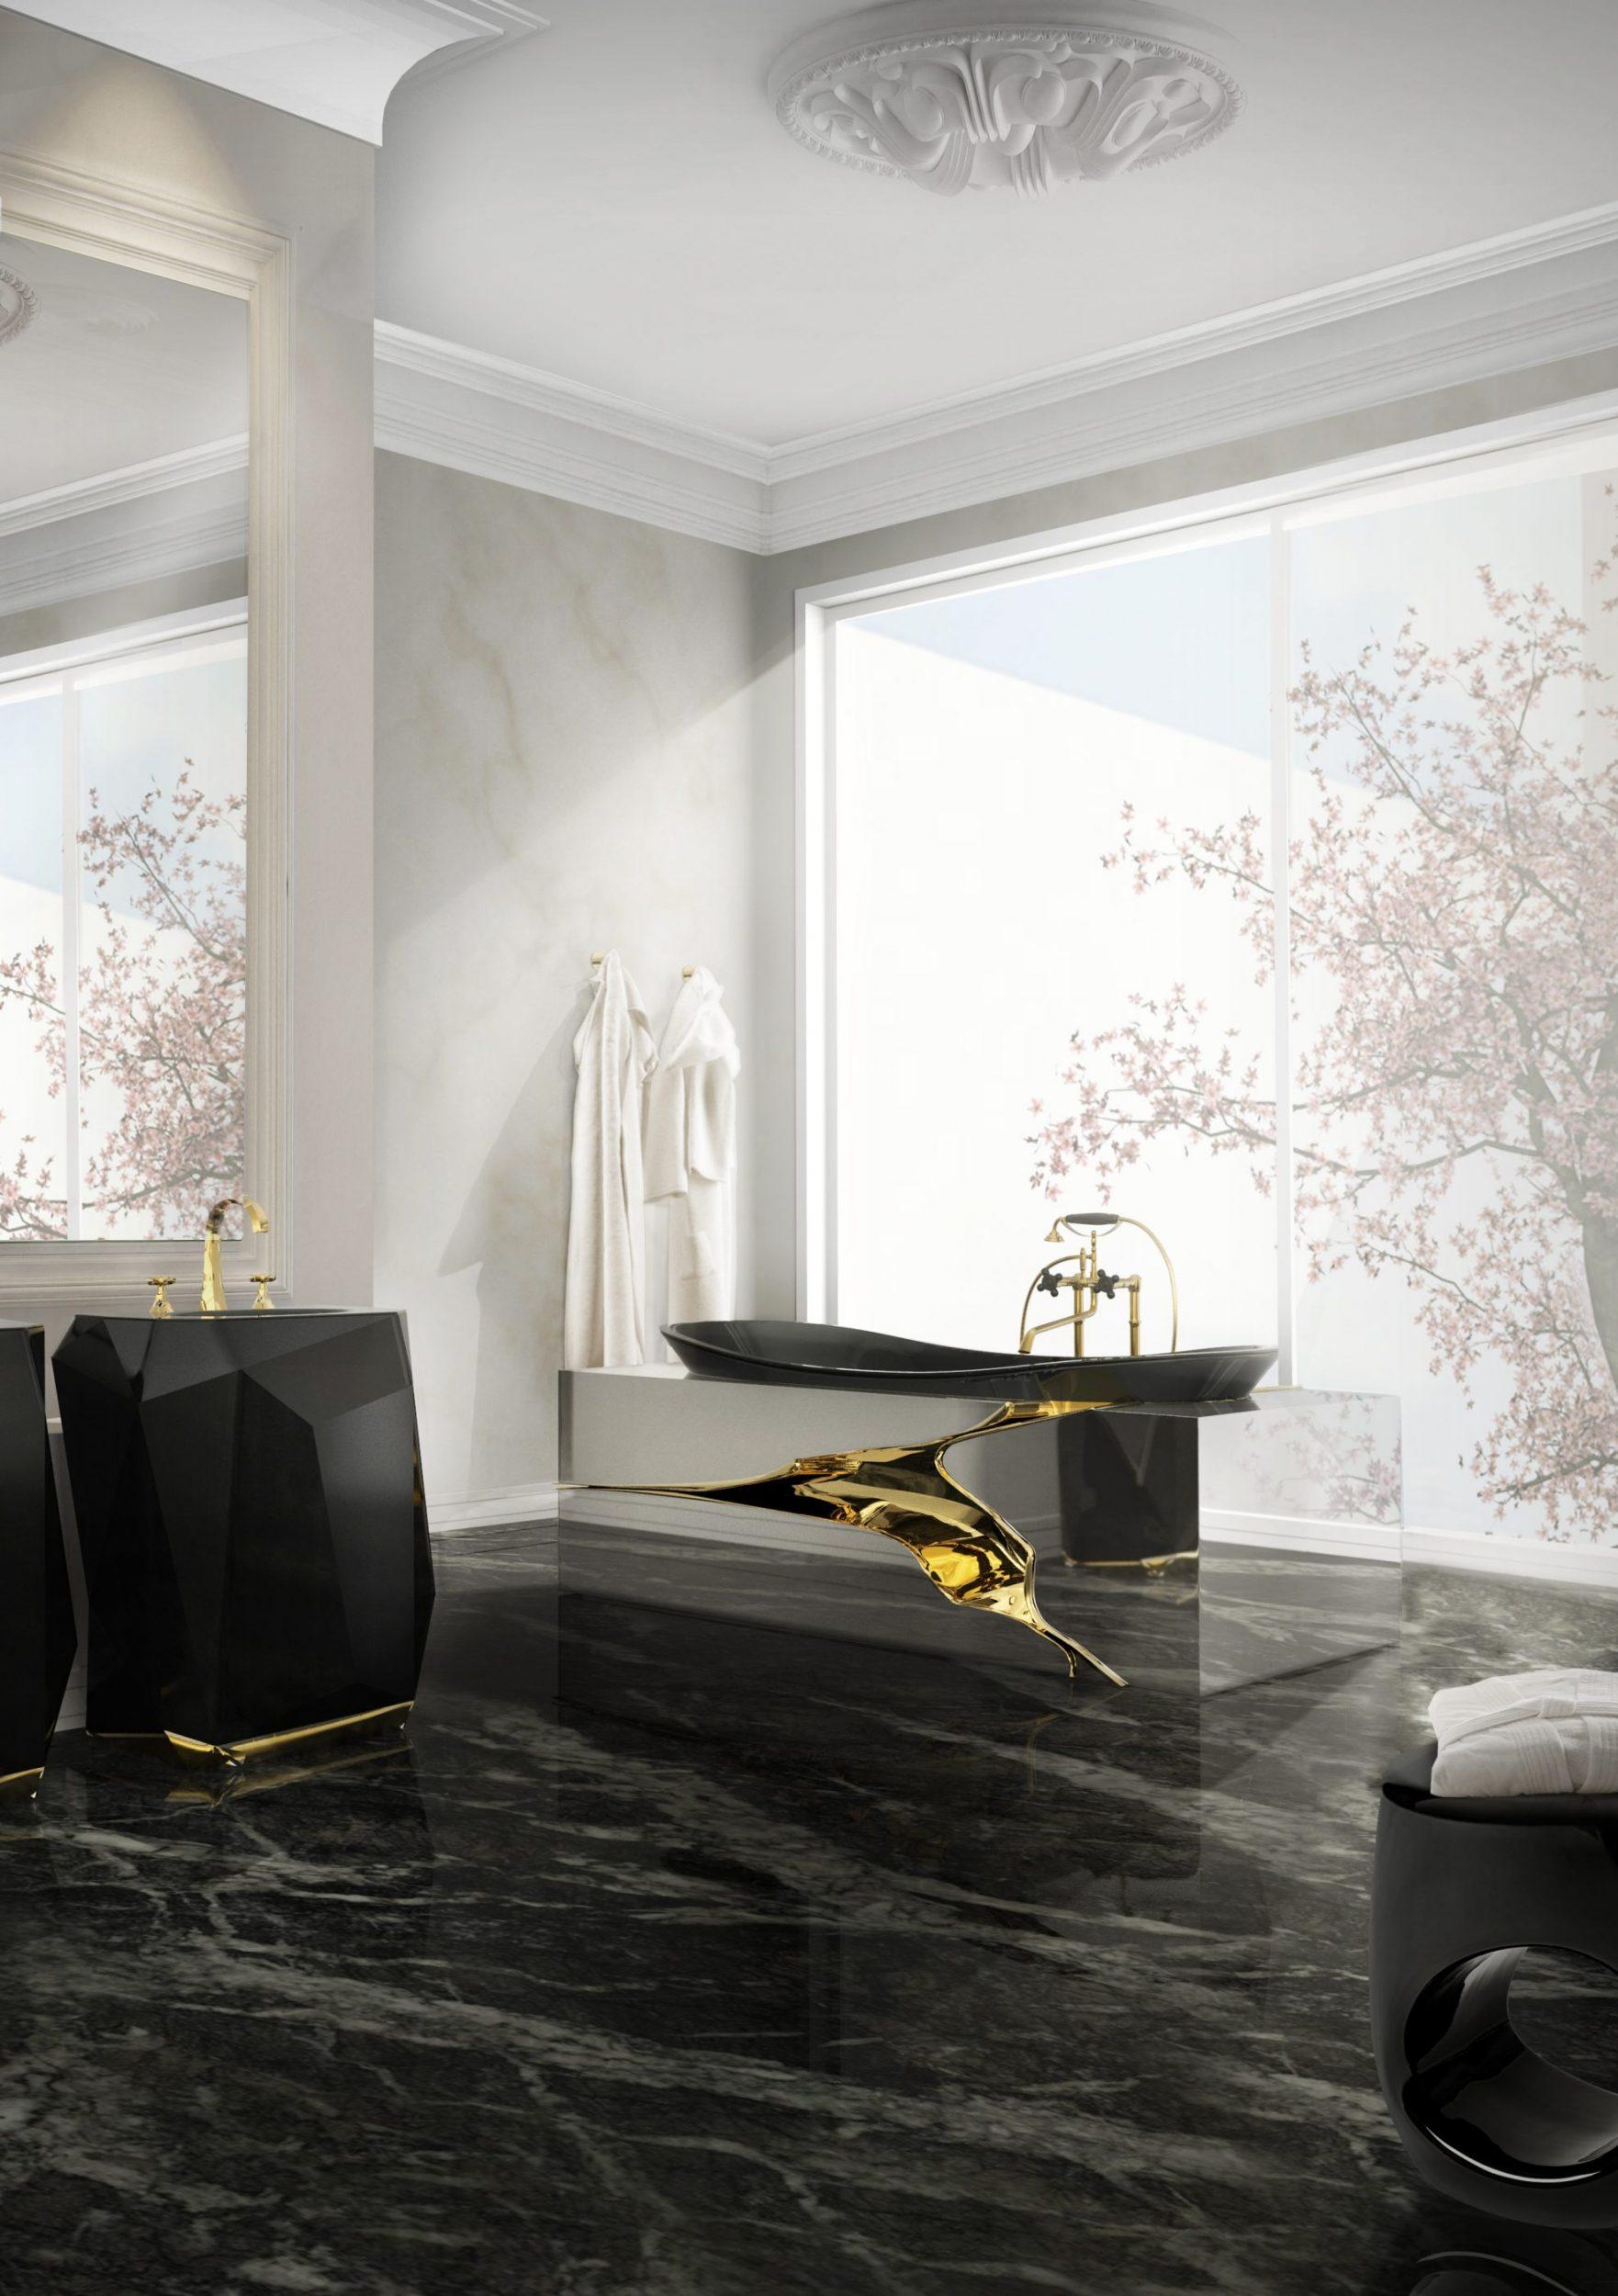 Salle De Bain Low Cost maison valentina, ideas for a contemporary salle de bain